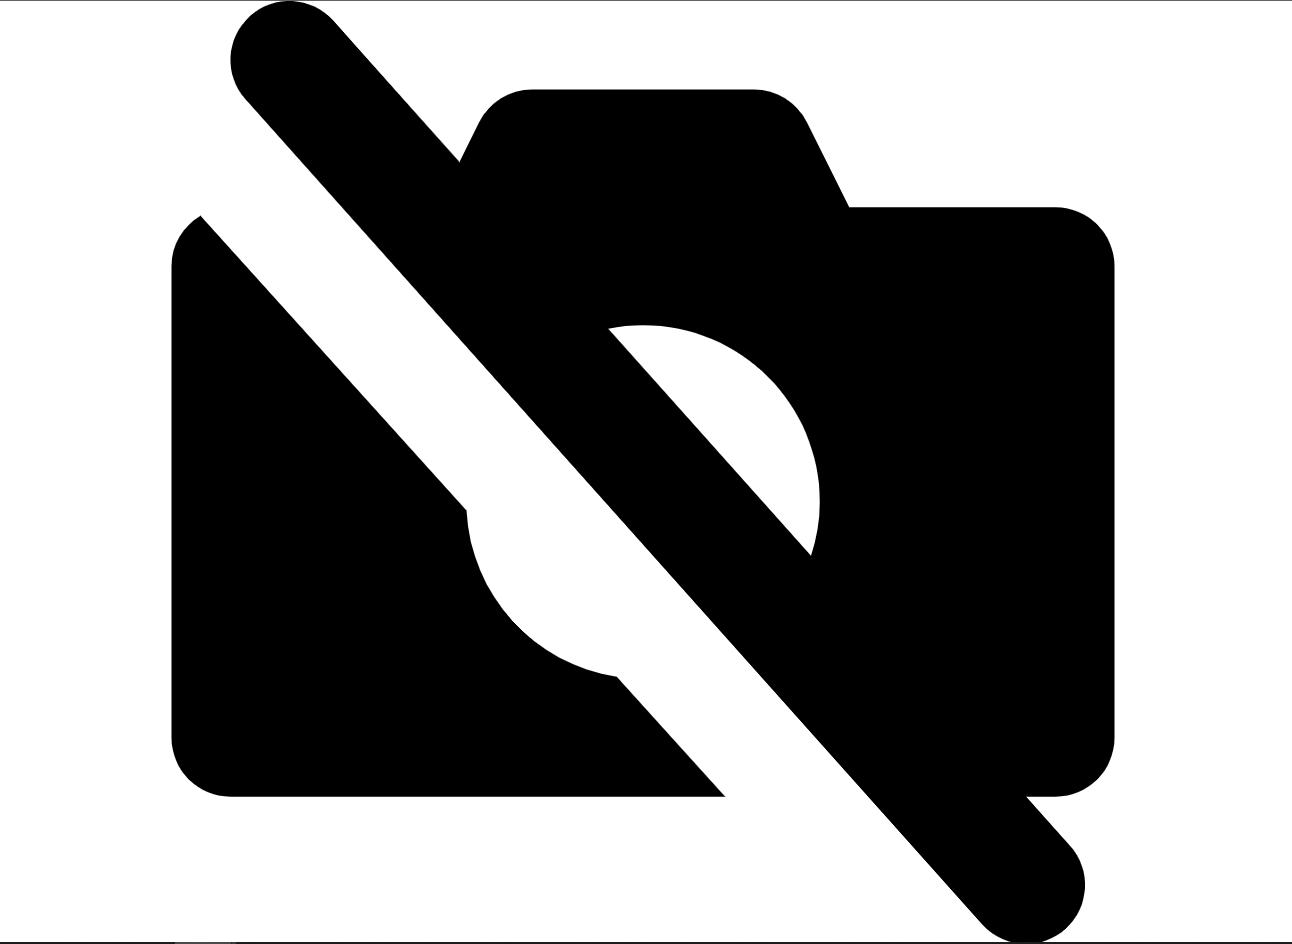 Kit Pis/anel Metal Leve Biz125 0.25 9294